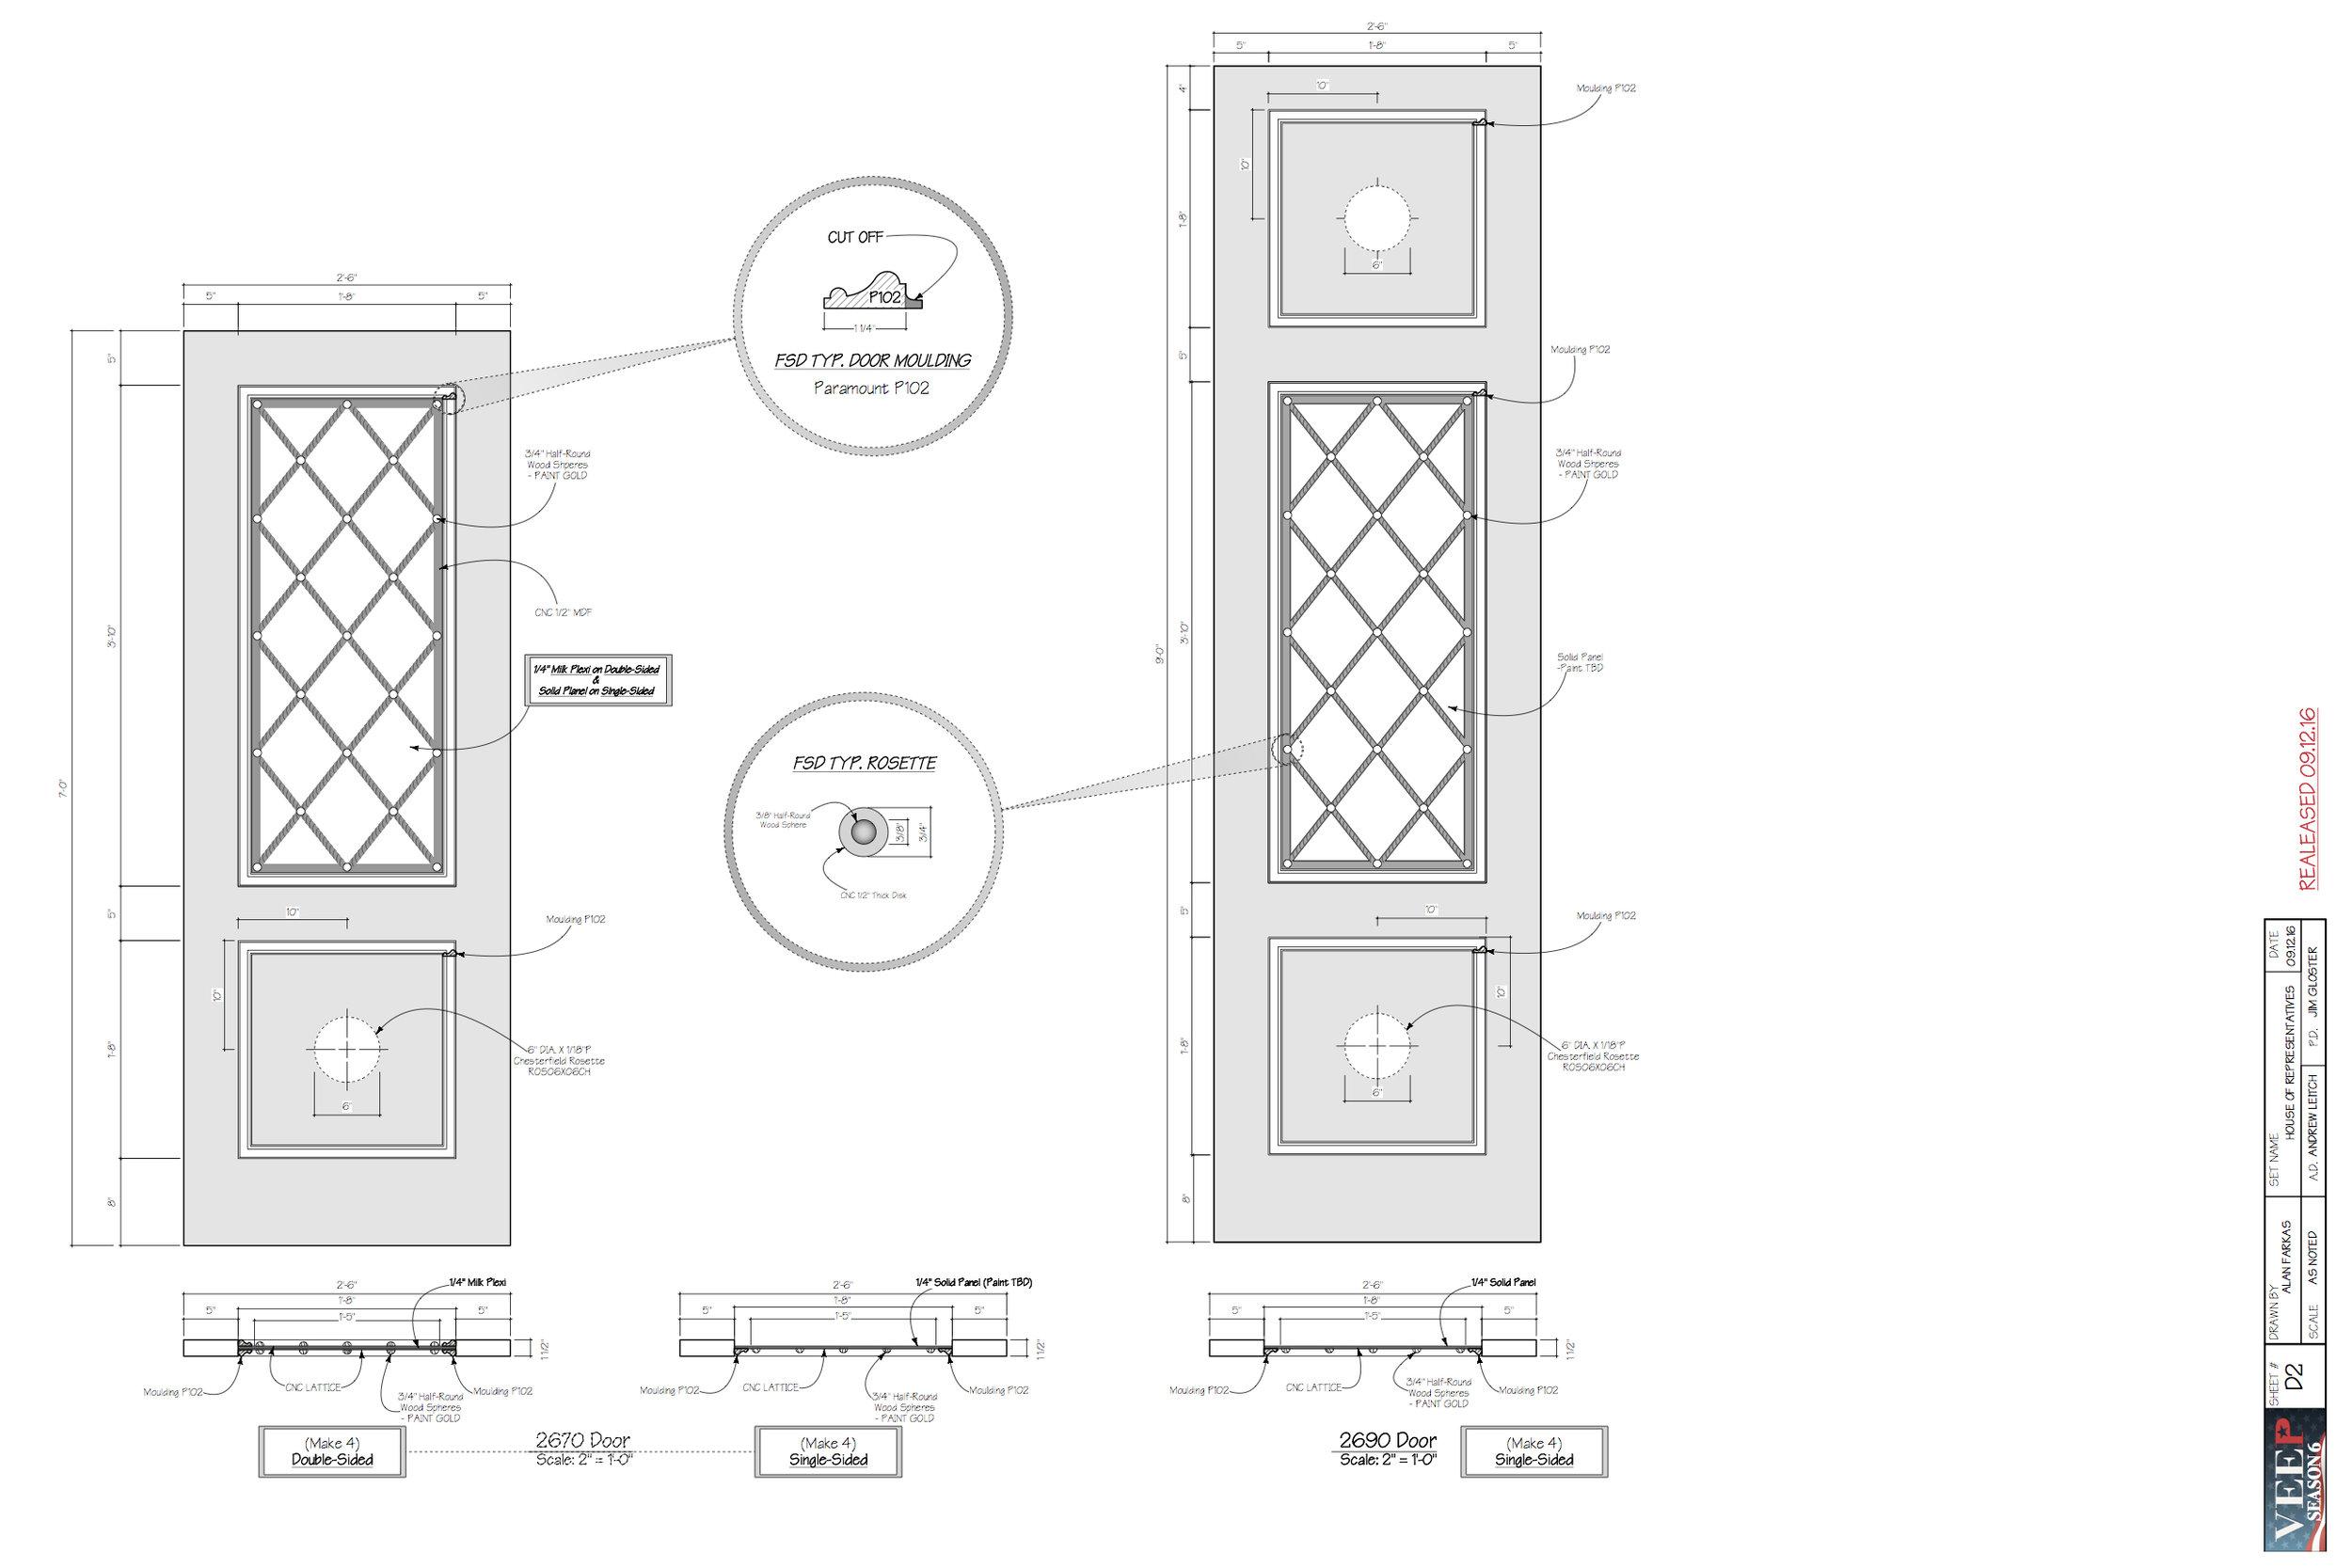 House of Reps_v13_DOOR DETAIL_RELEASE 09.12.16.jpeg